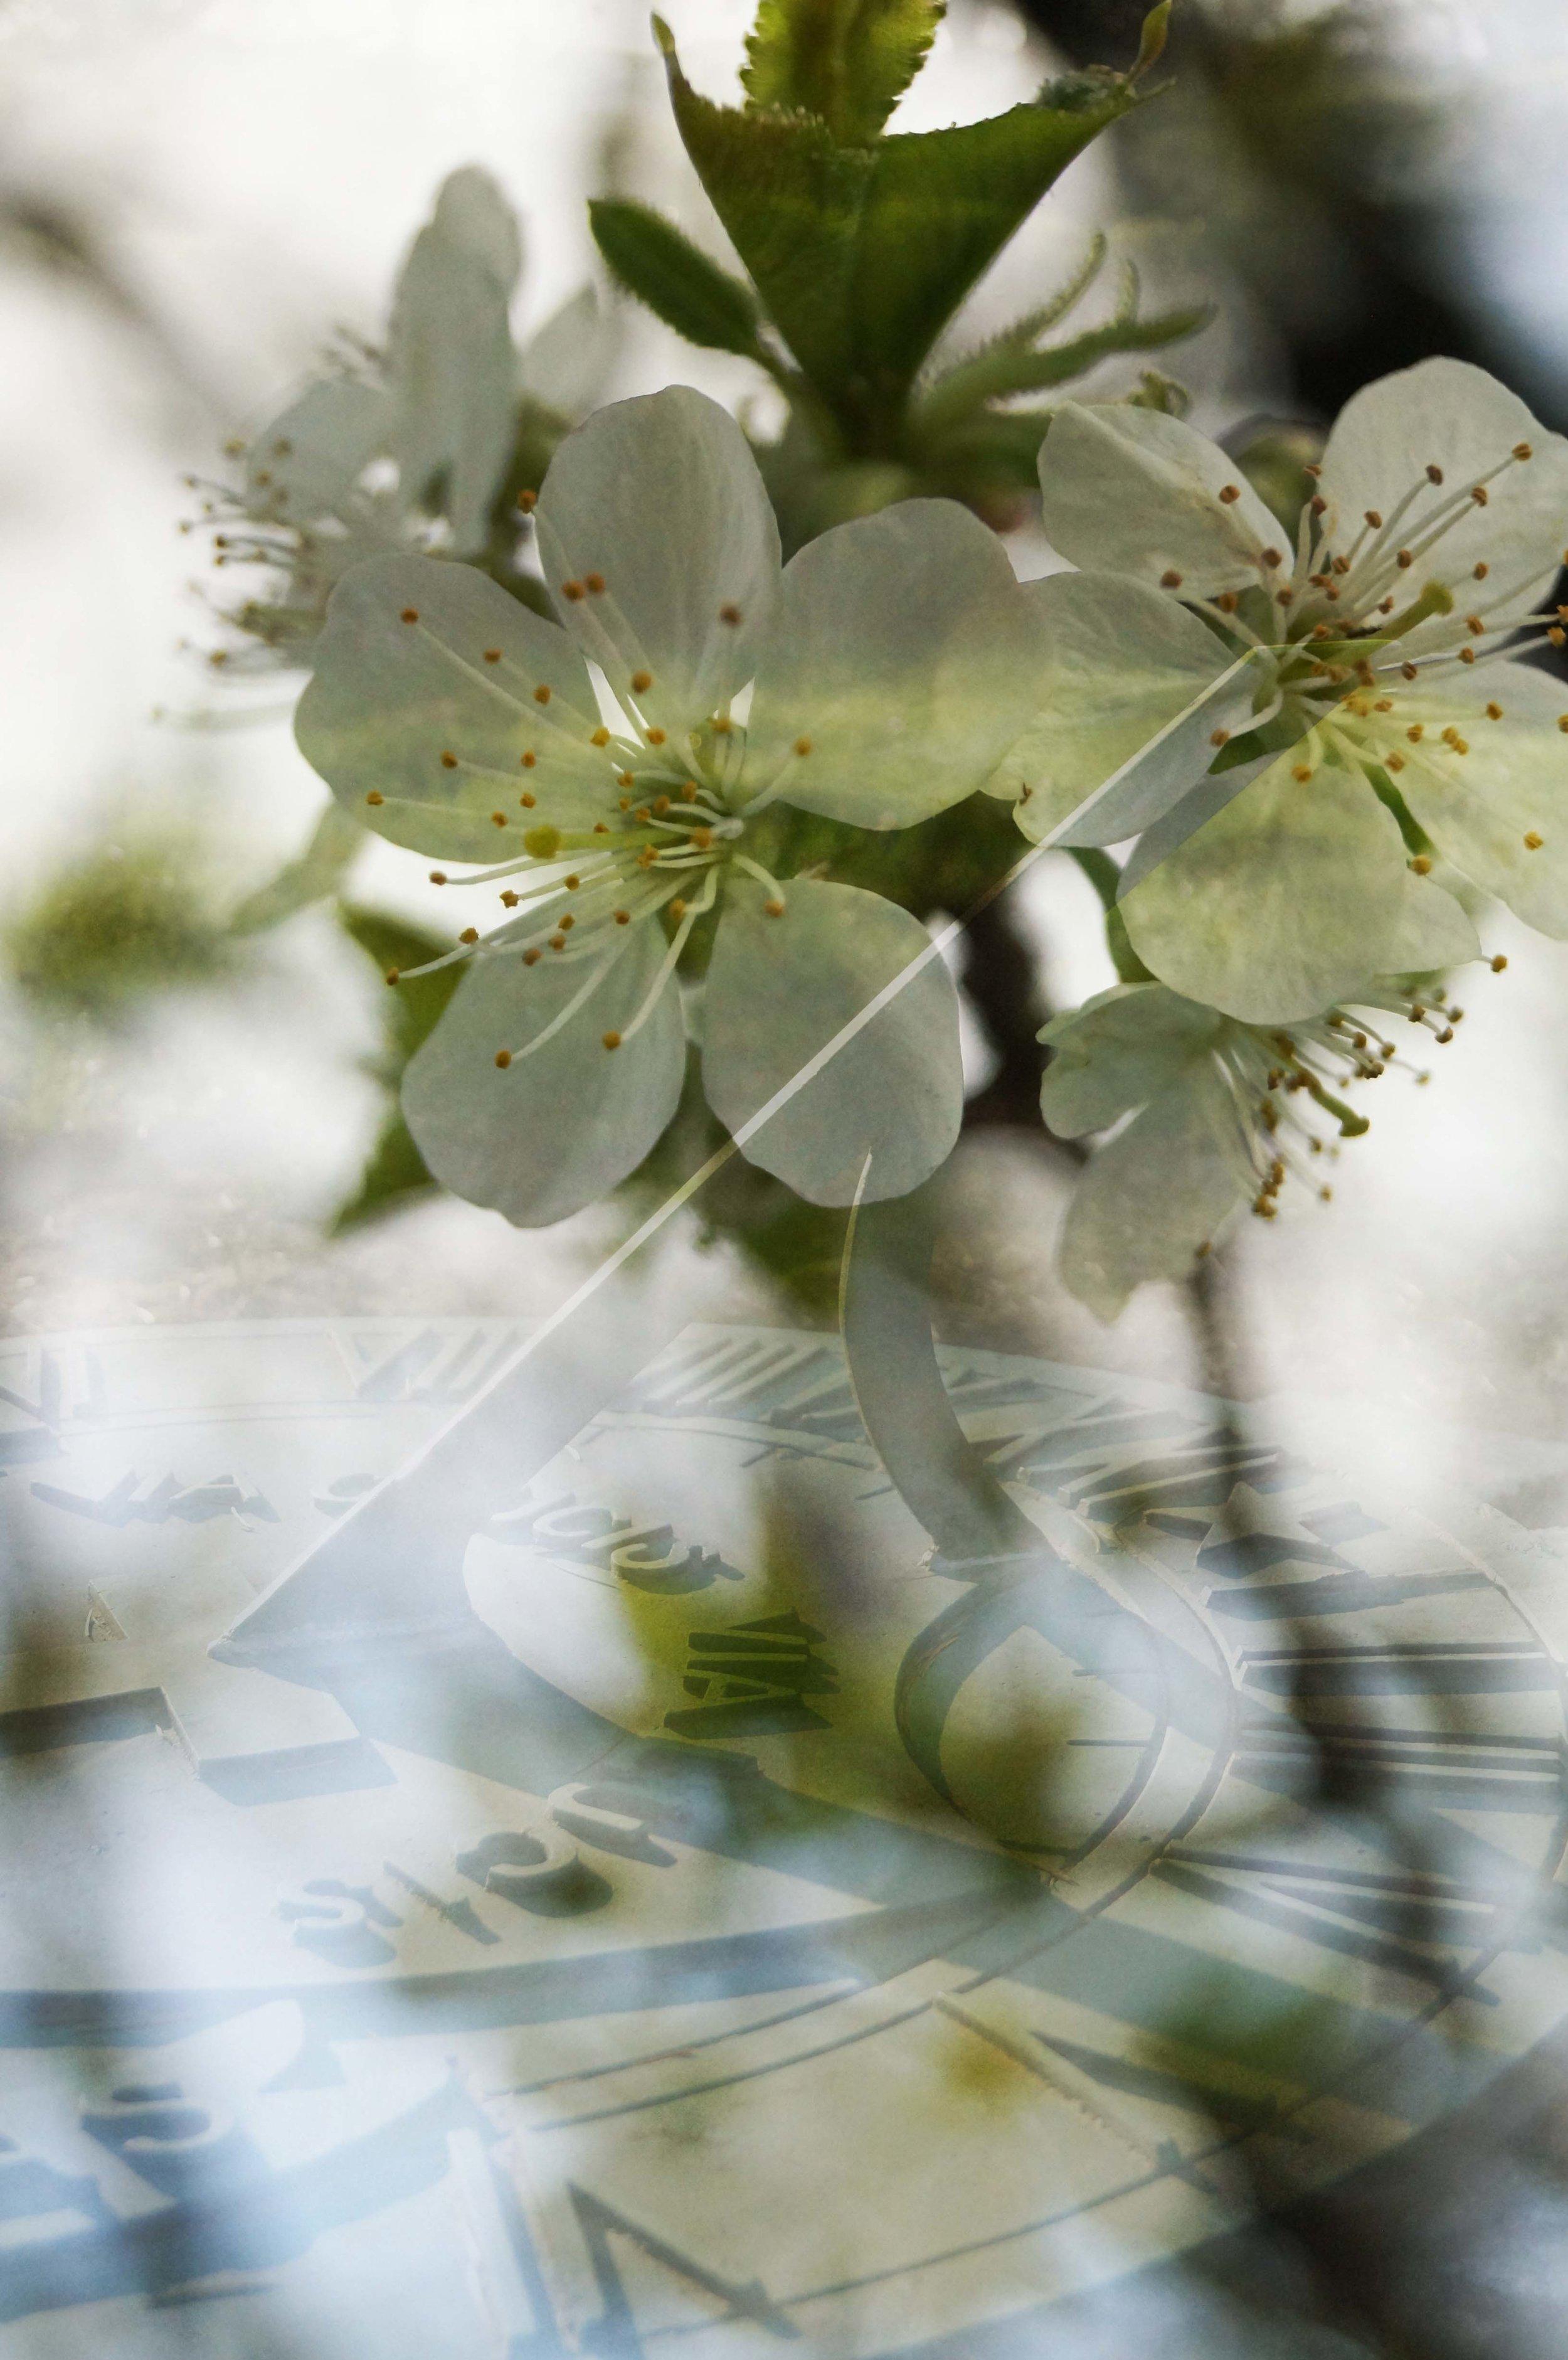 Moment_Series--Blossom_Time_4P.jpg